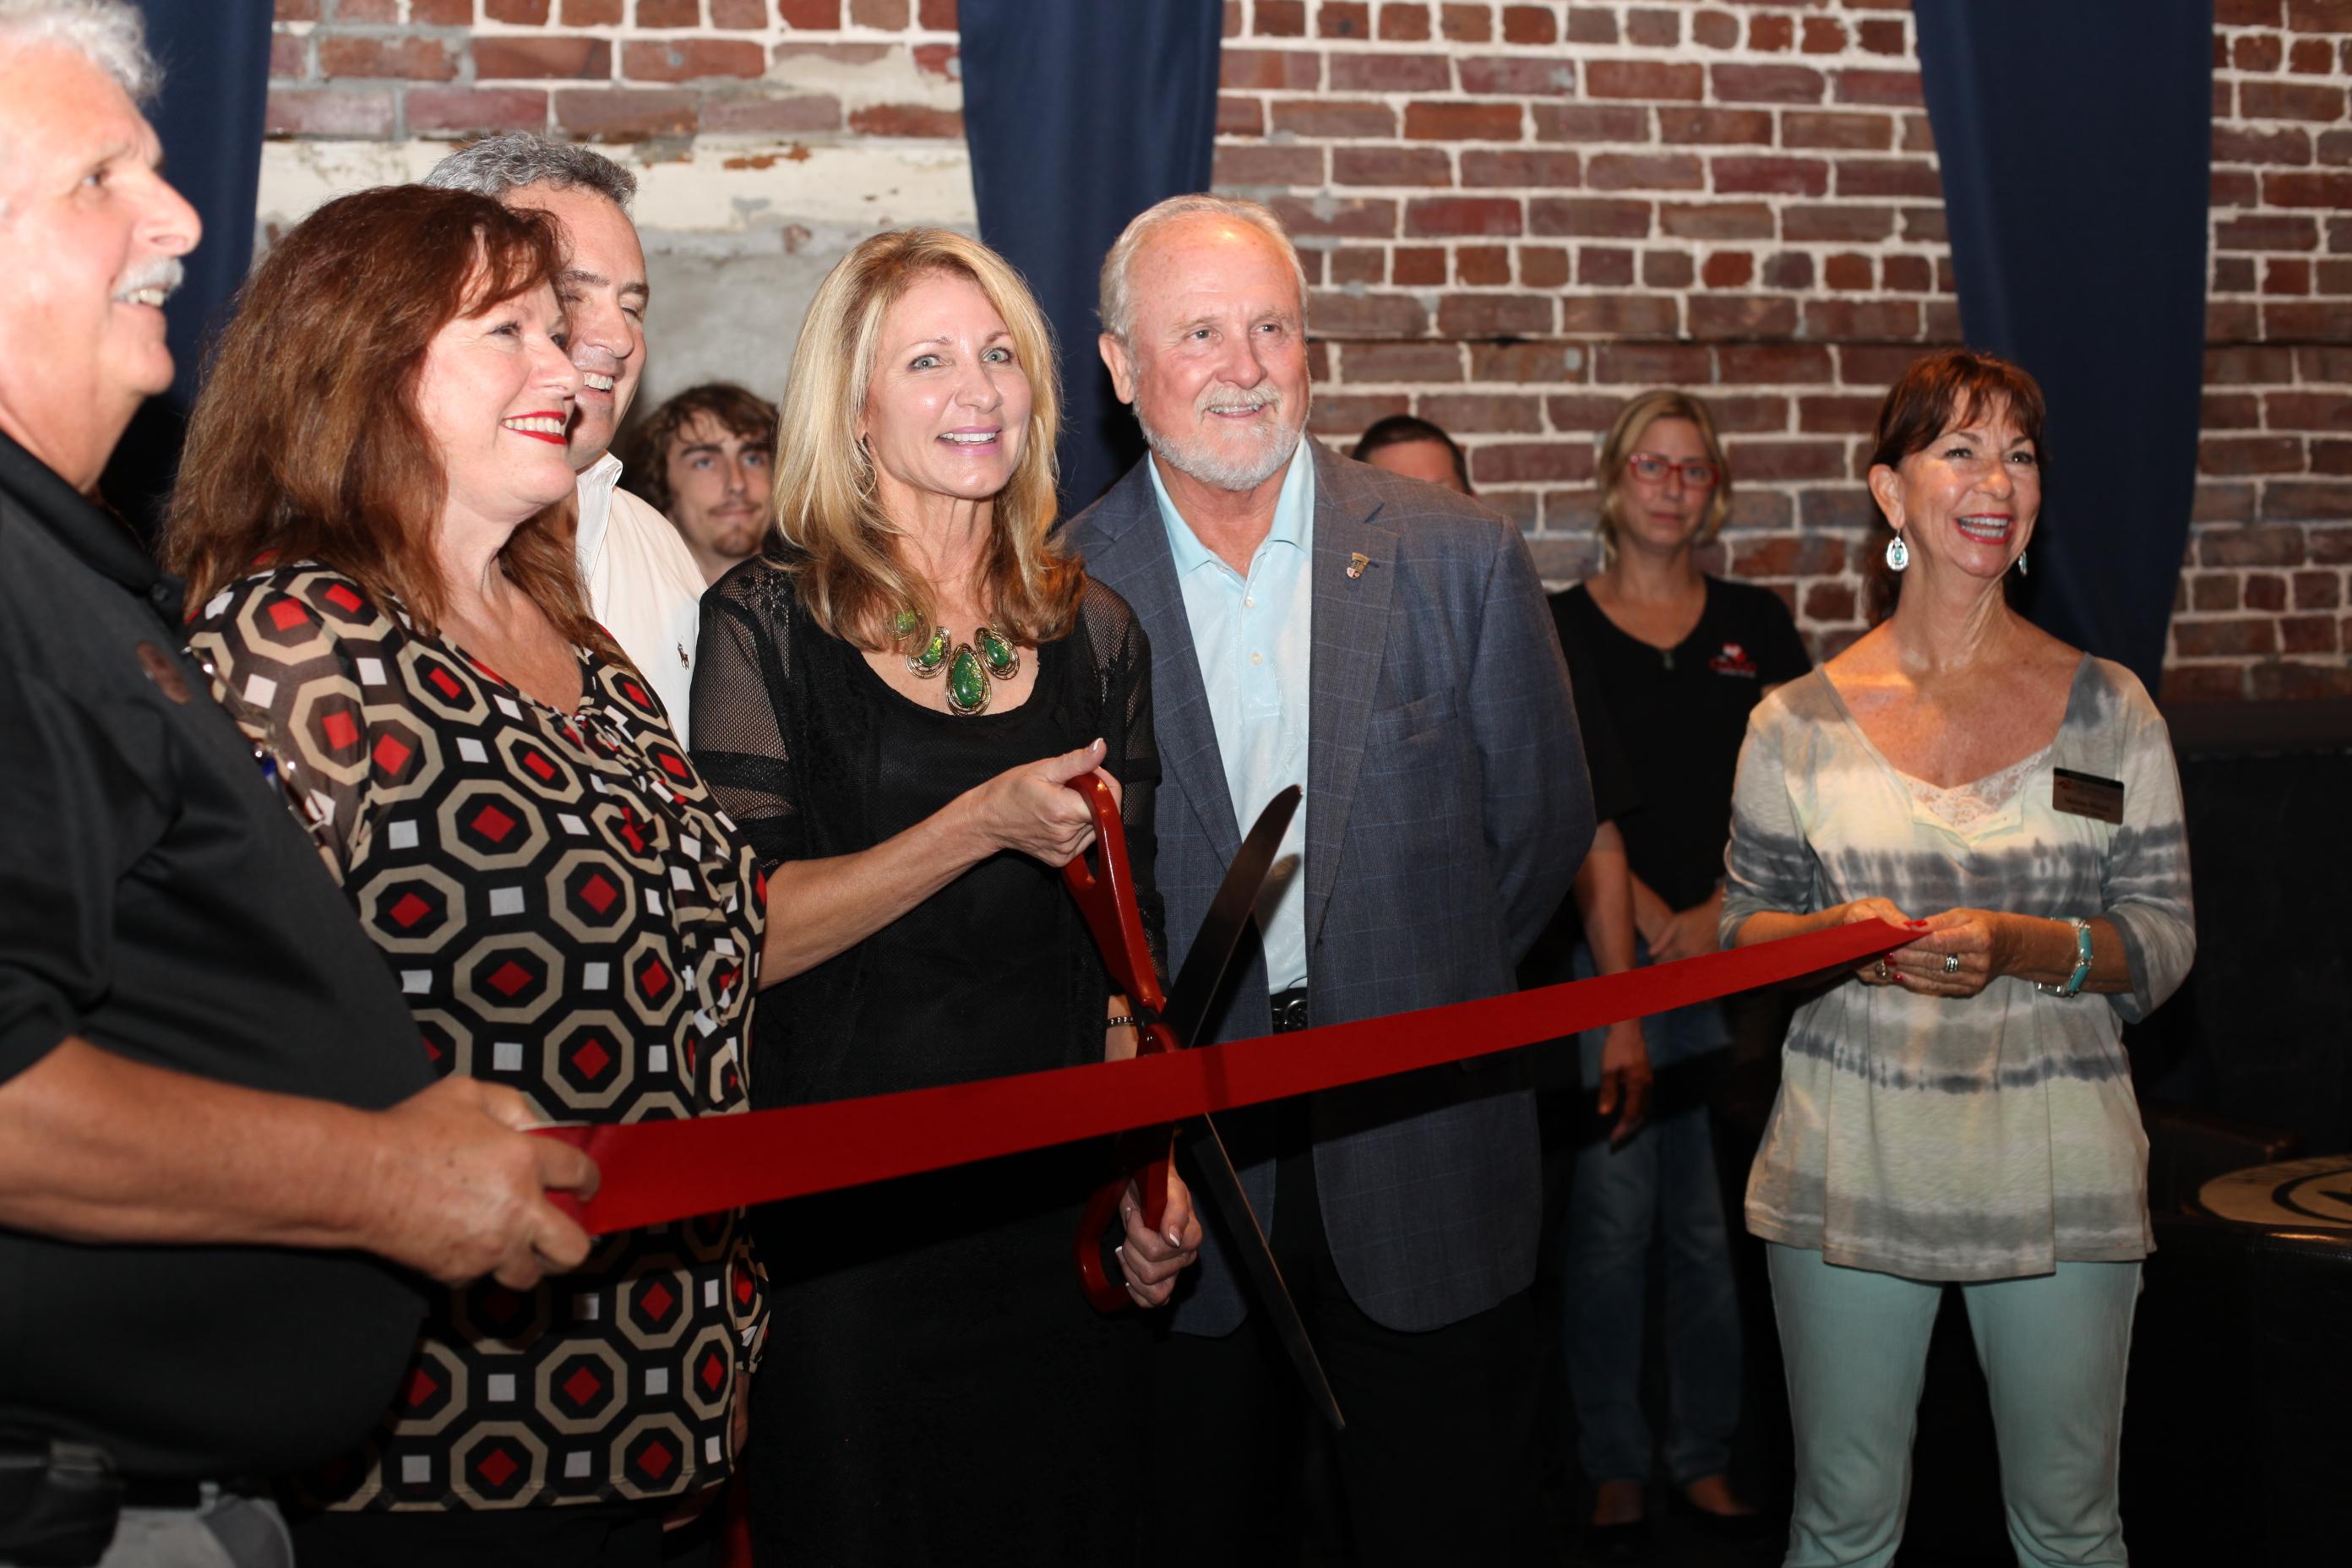 The Corazon Cinema & Cafe opens with ribbon cutting with Mayor Joe Boles